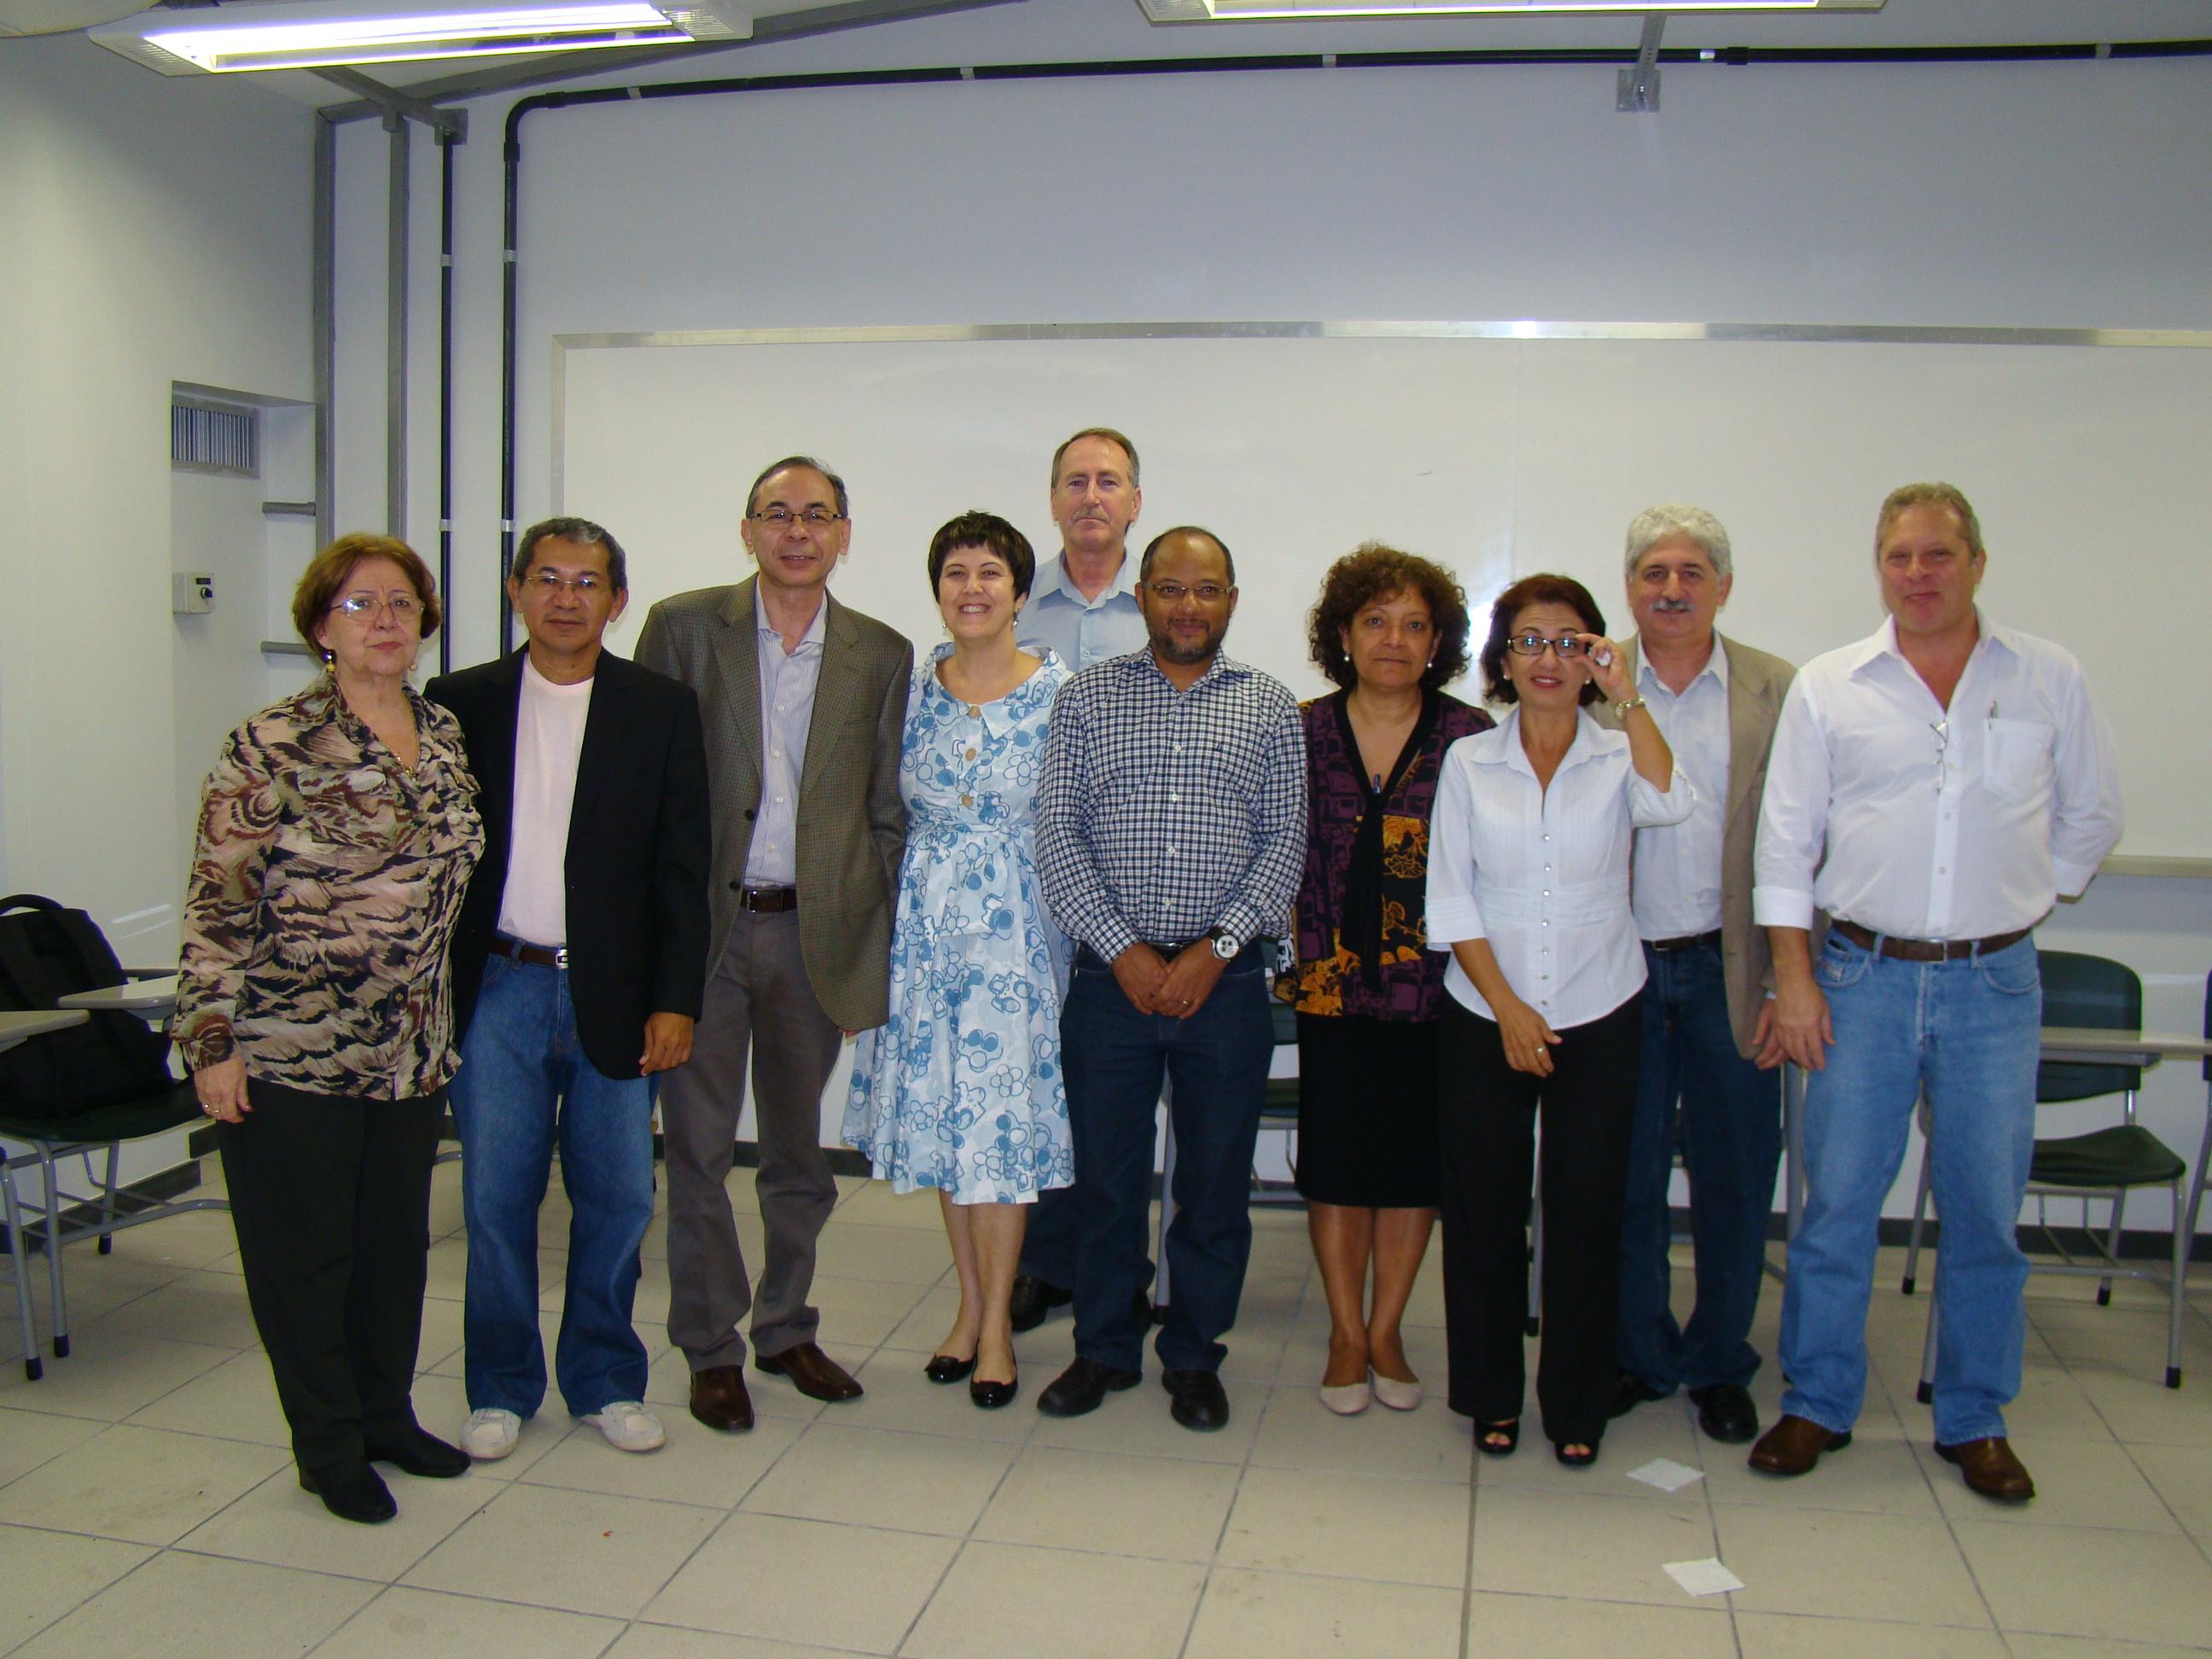 2012-05-05-Posse-da-III-Diretoria-da-Atens-Nacional-BH-MGDSC02906